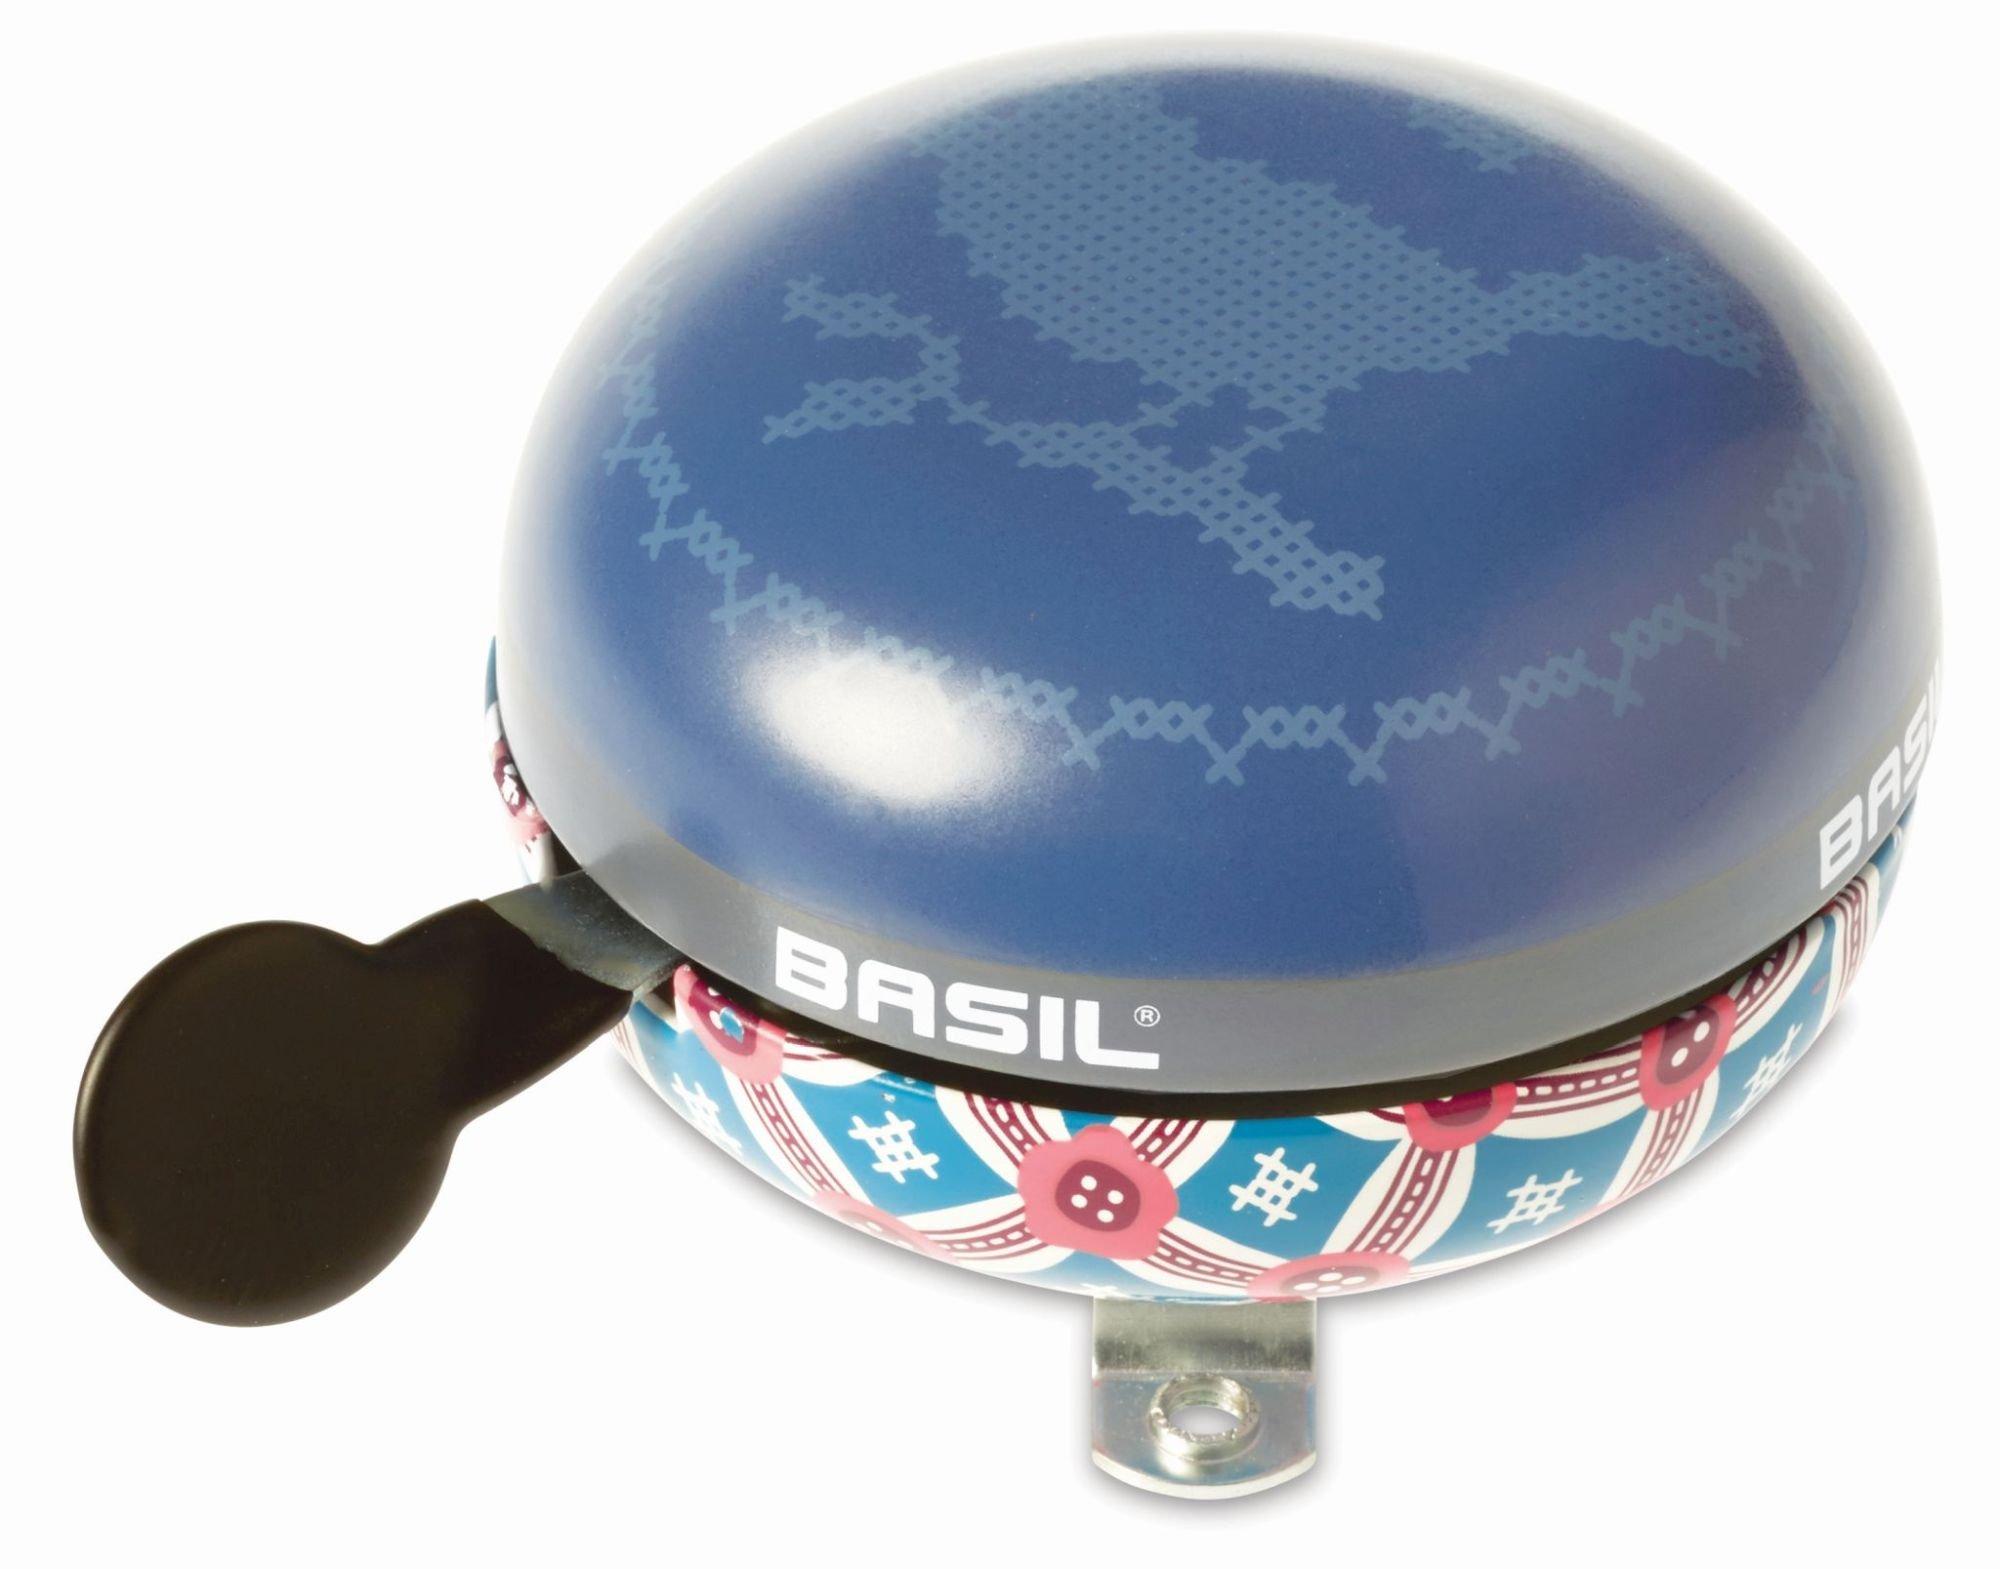 glocken & hupen/Klingeln & Hupen: Basil  Big Bell Bohème Glocke 80mm